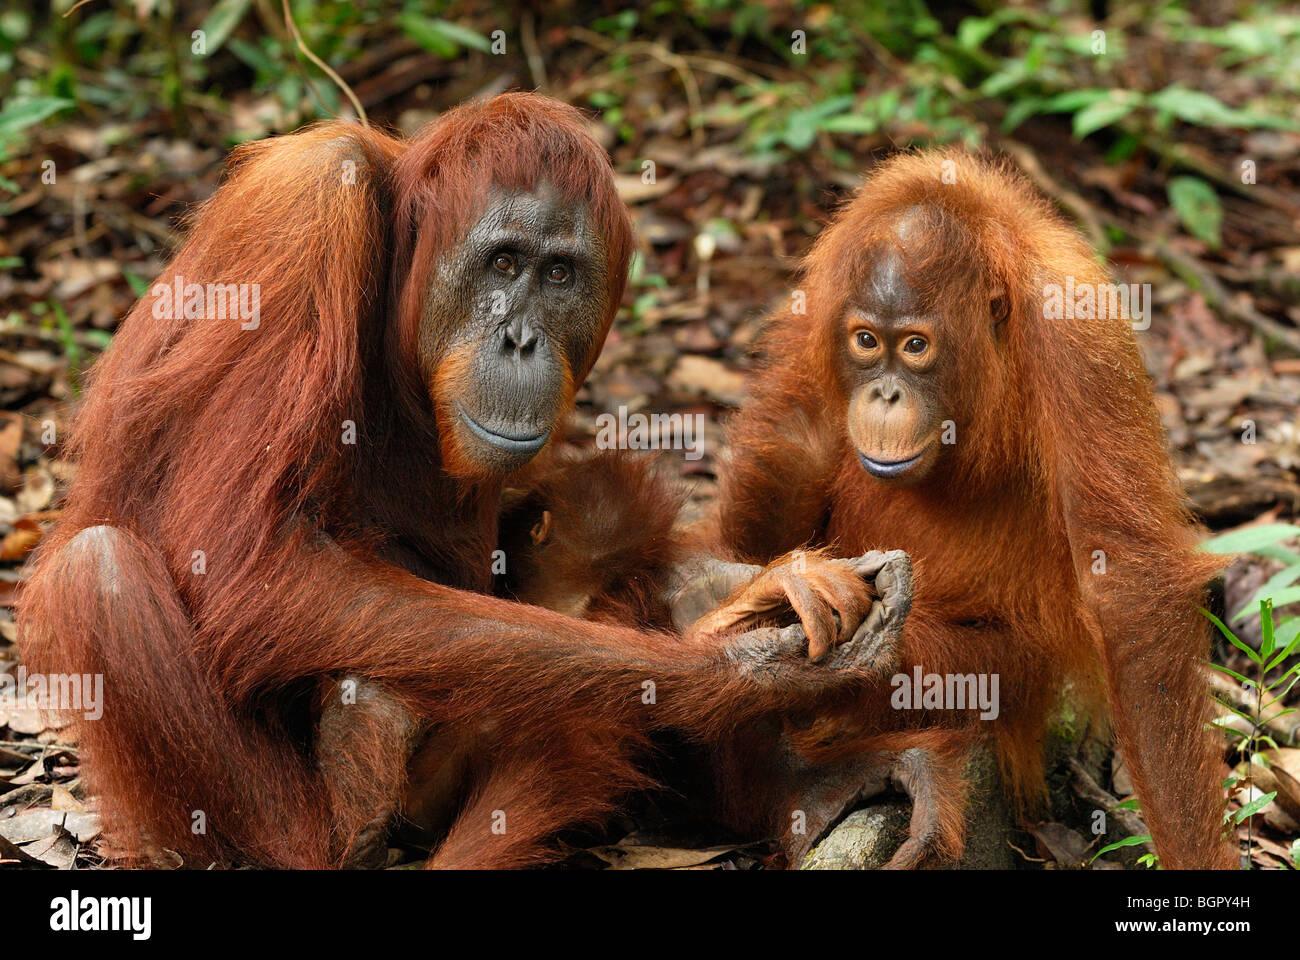 Borneo Orang-Utan (Pongo Pygmaeus), Frau mit einem Baby, Camp Leaky Tanjung Puting Nationalpark, Kalimantan, Borneo, Stockbild